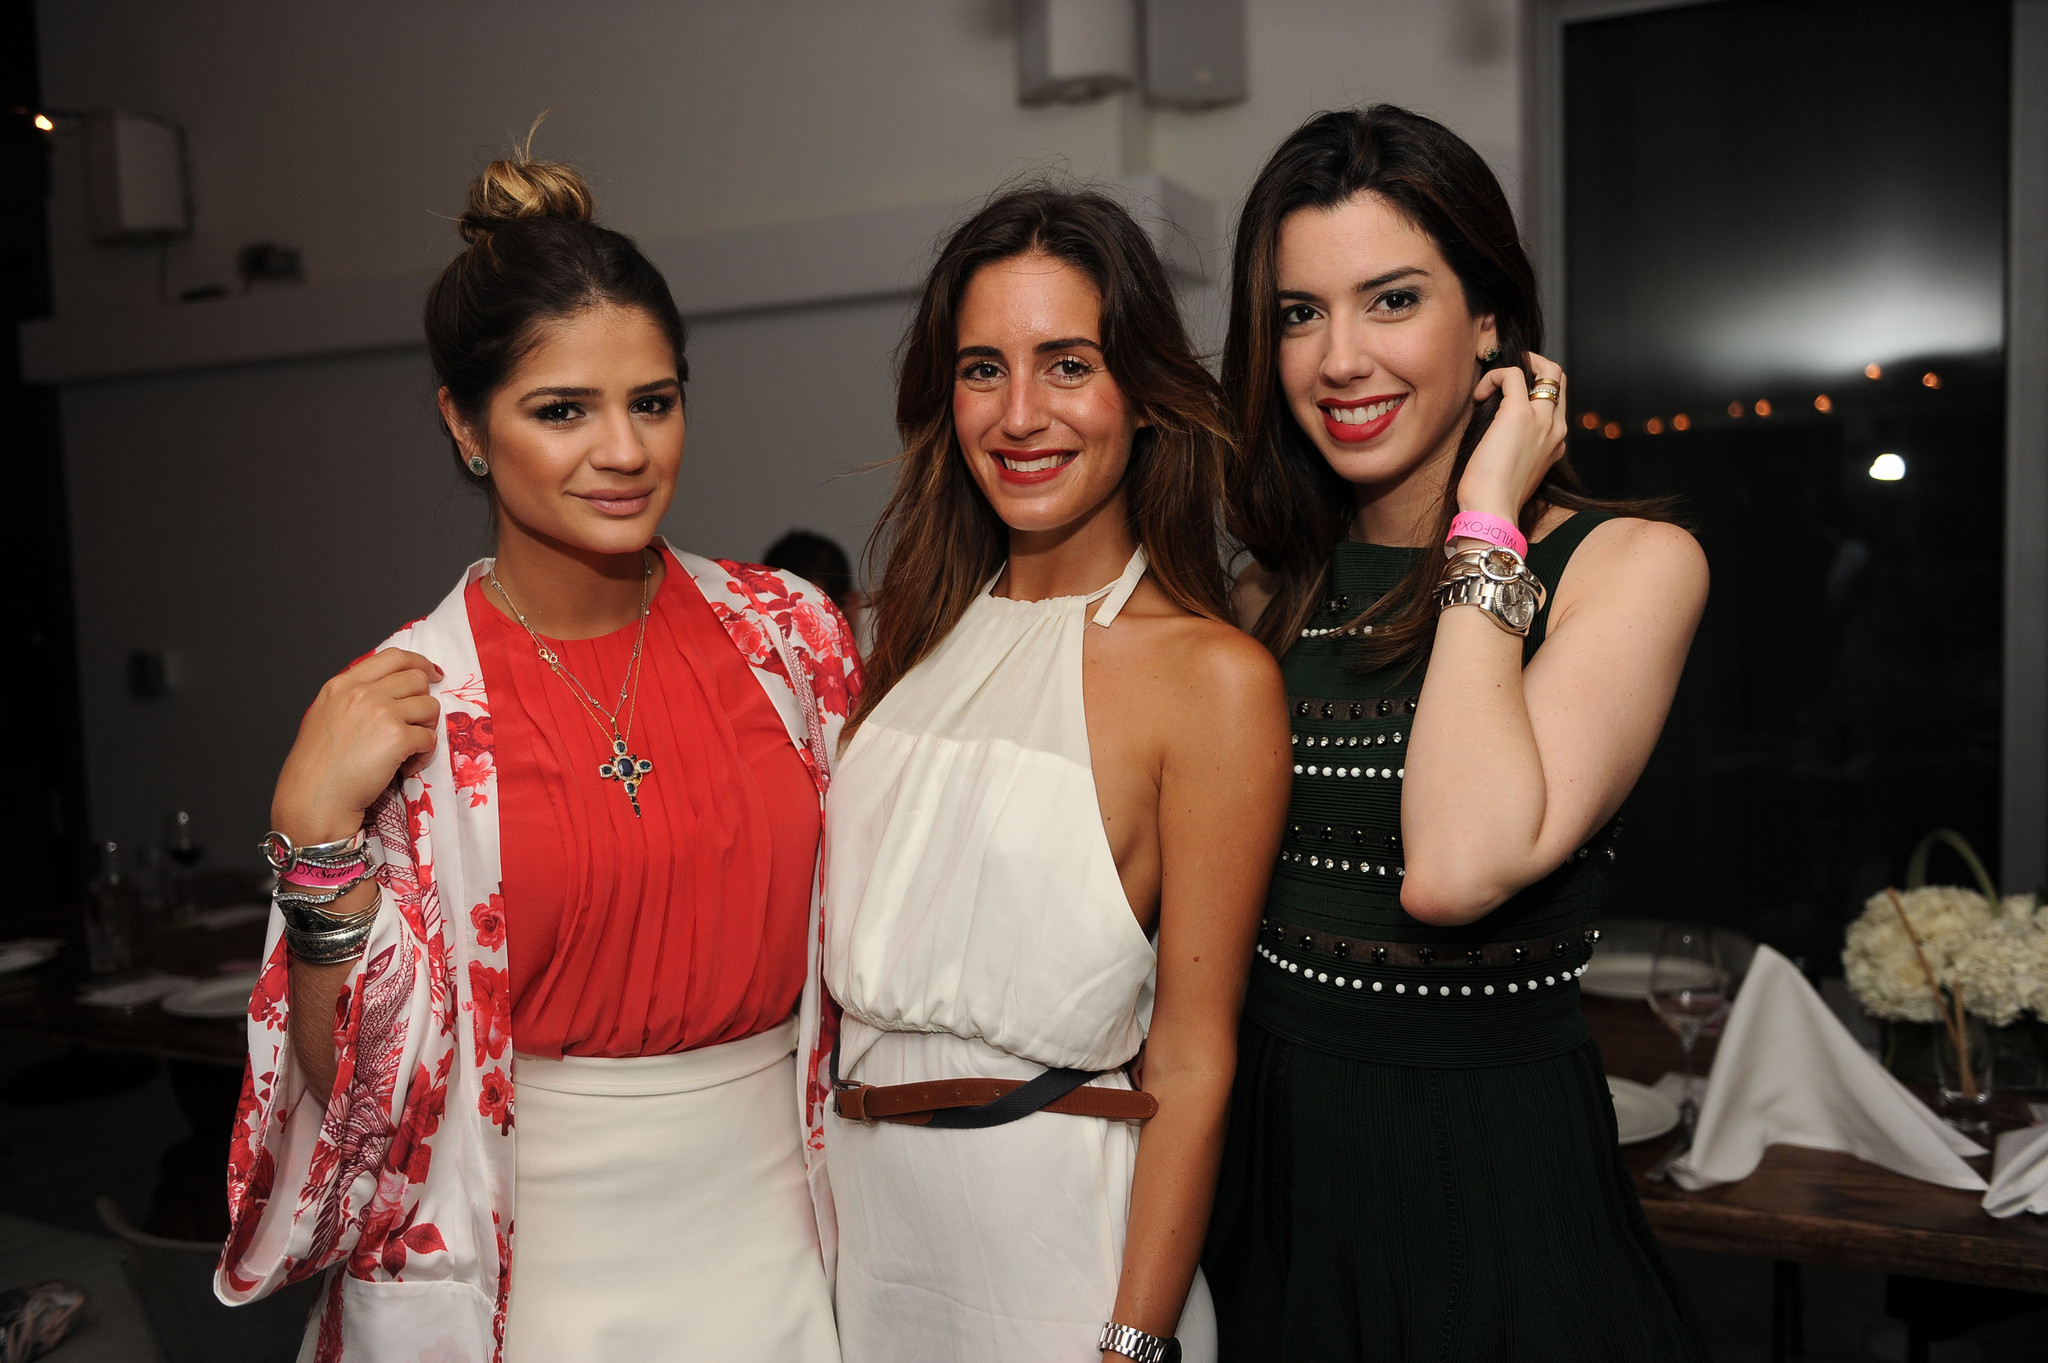 Society Scene photos - L to R: Thaissa Naves, Gala Gonzalez , Camila Coutinho